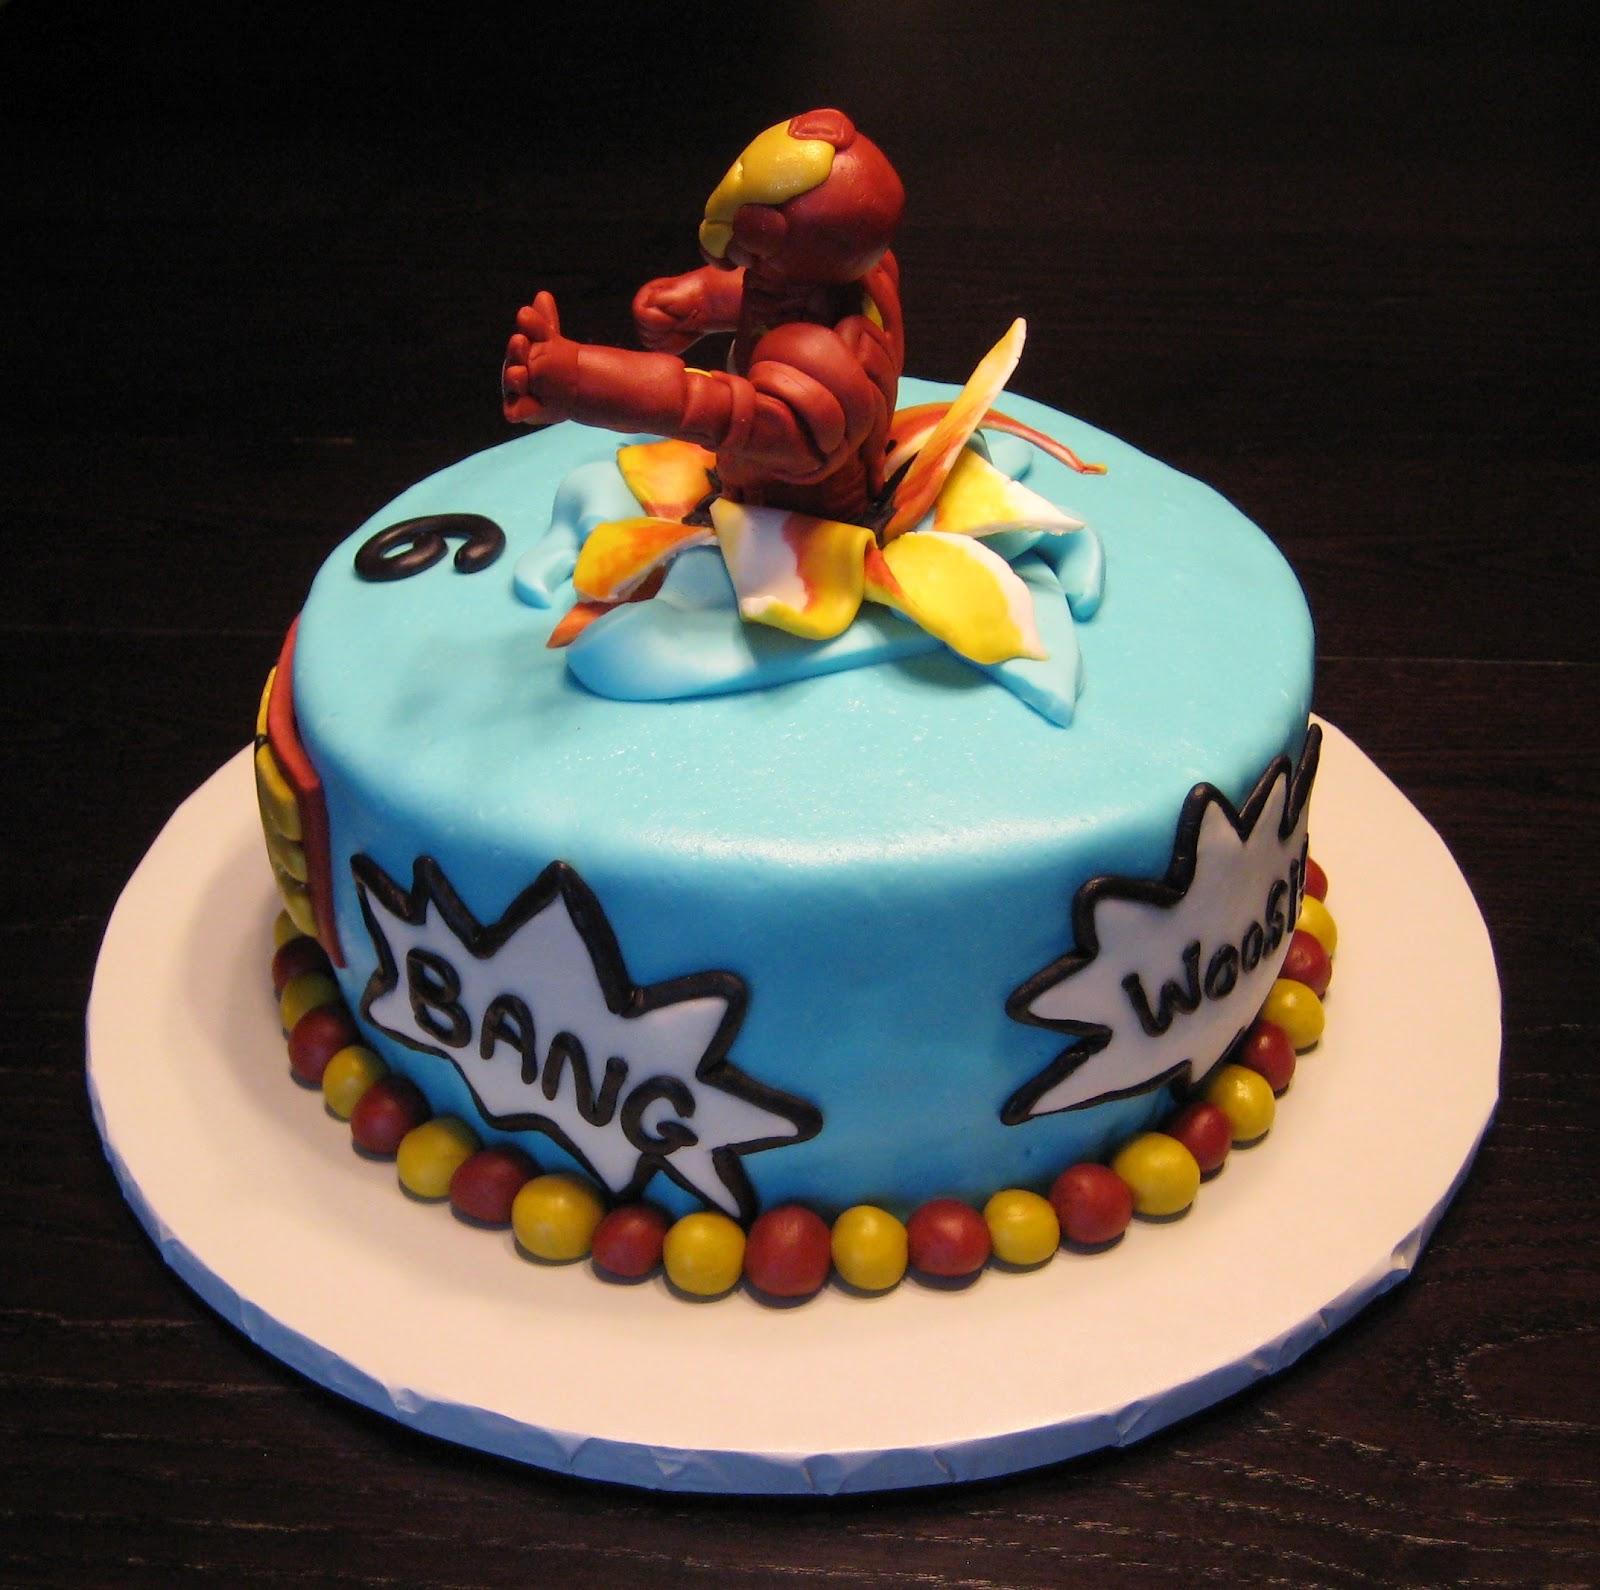 Custom Cakes By Julie: Iron Man Cake